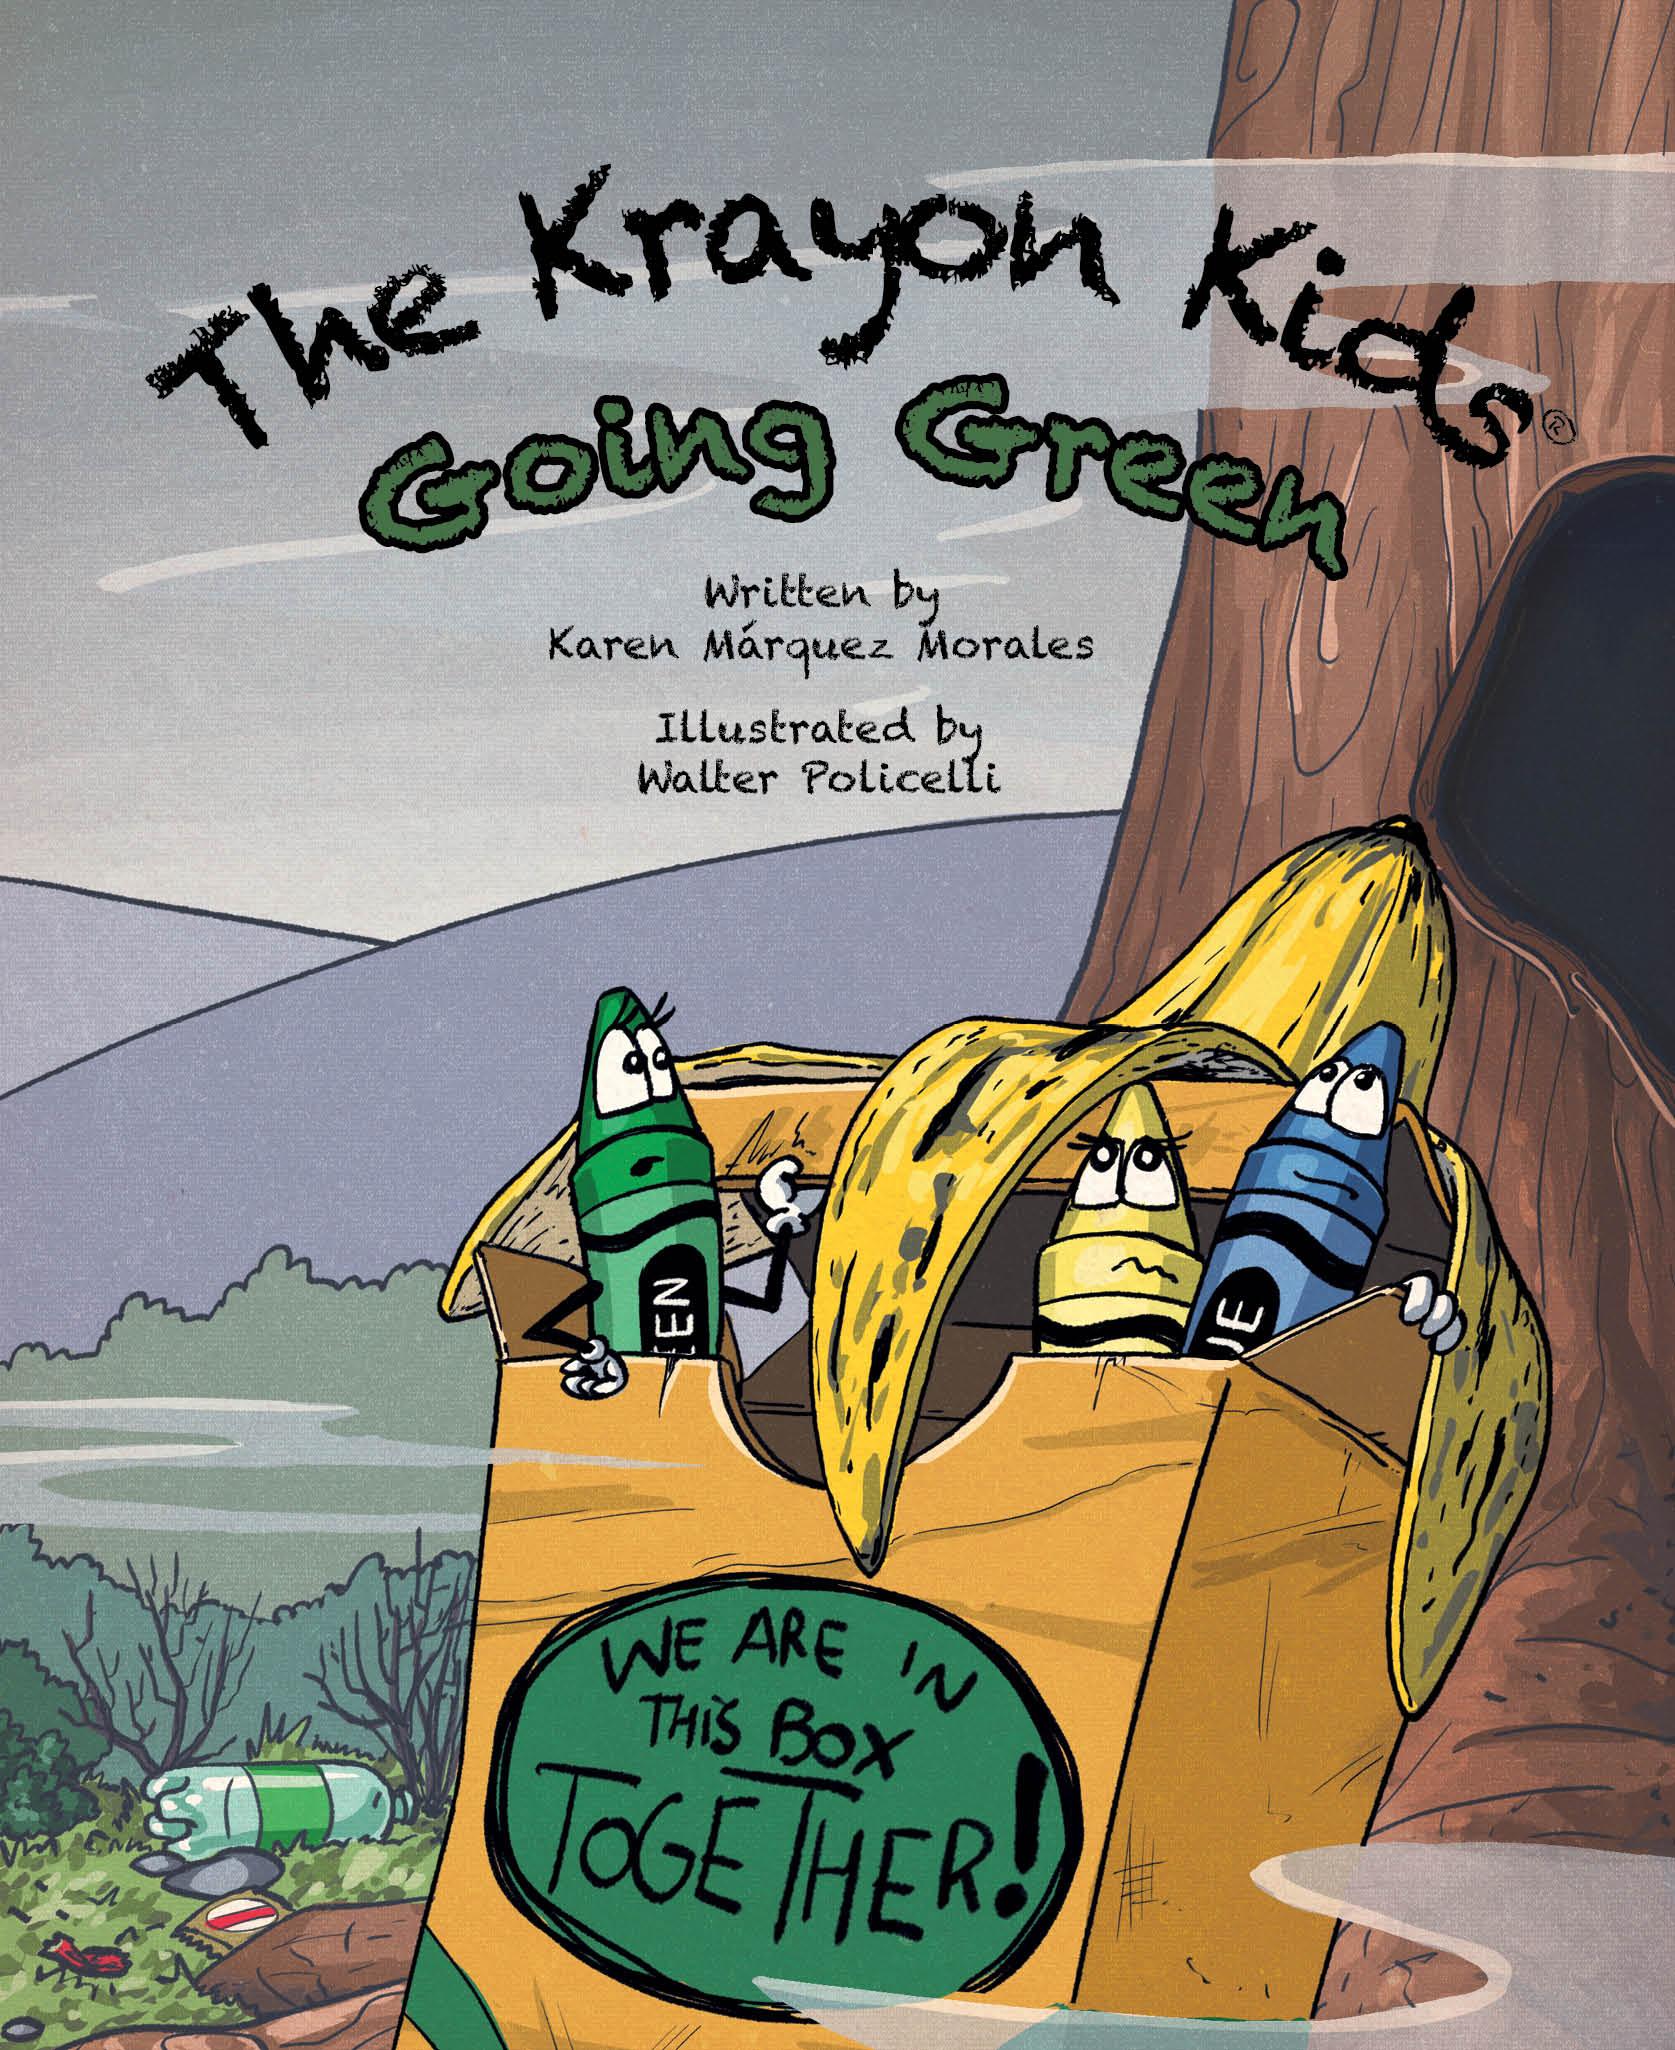 KrayonKidsGoingGreen_amazon